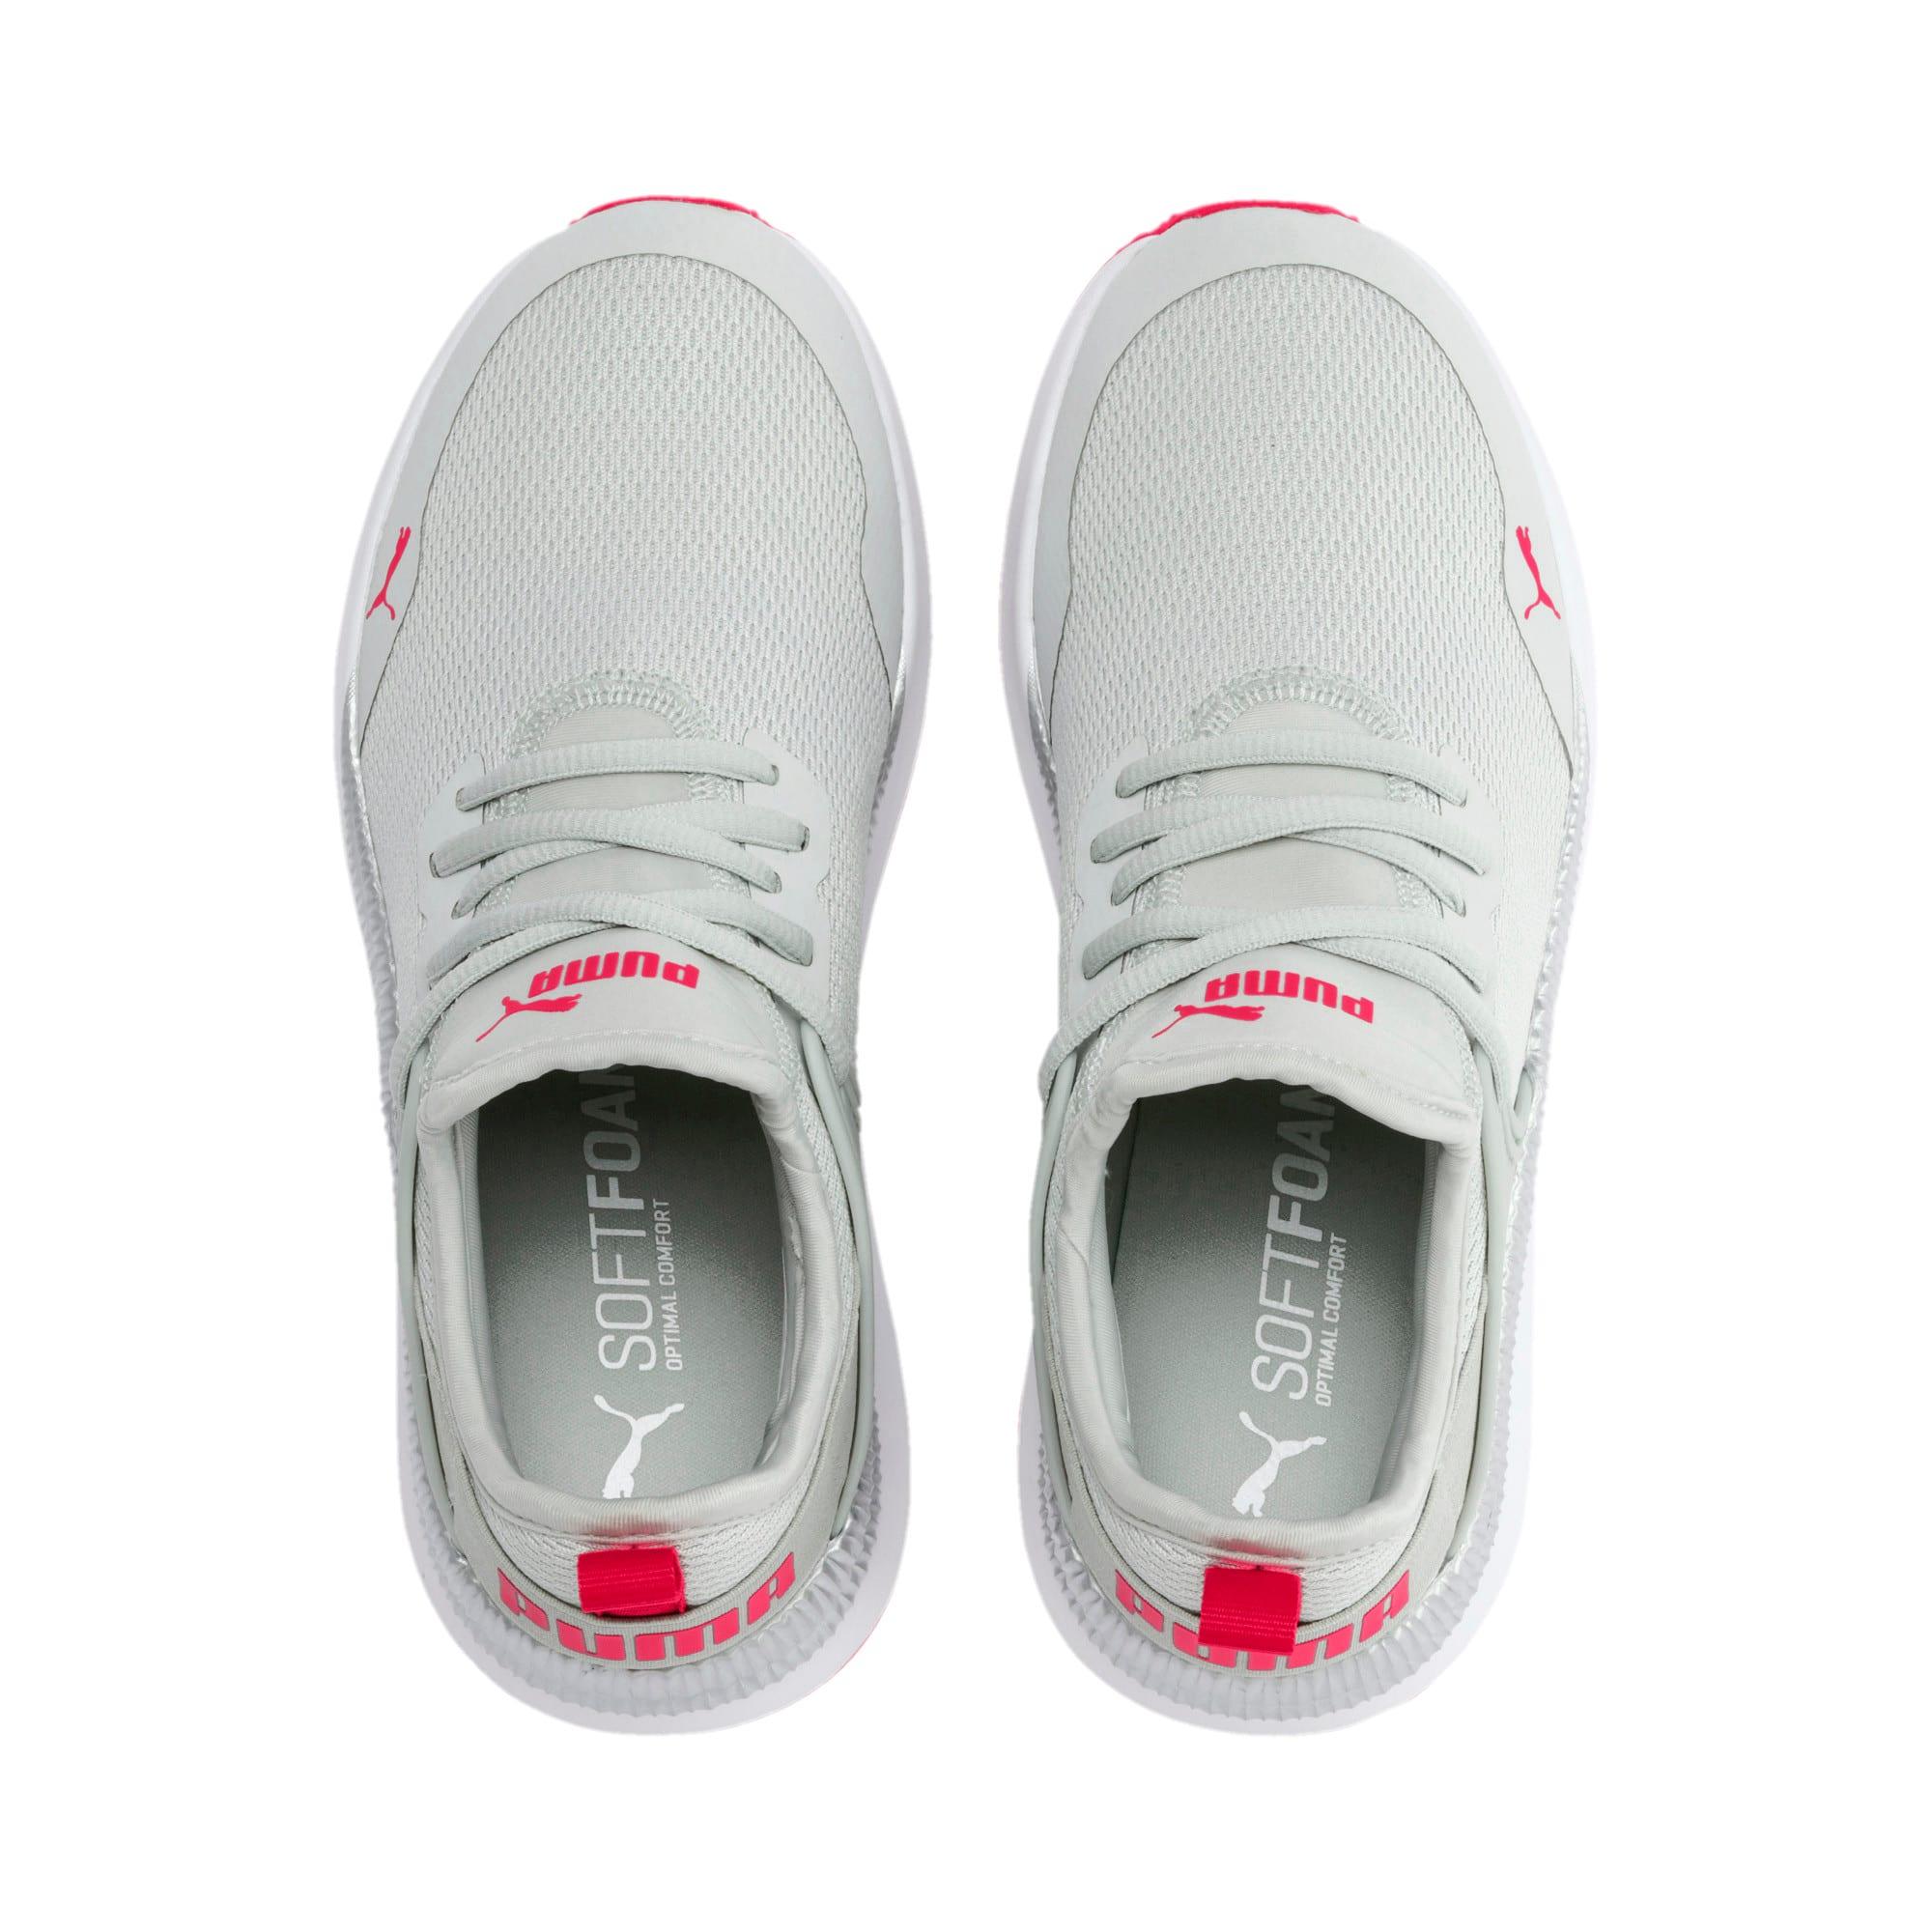 Thumbnail 6 of Pacer Next Cage Metallic Sneakers JR, Gray Violet-Nrgy Rose, medium